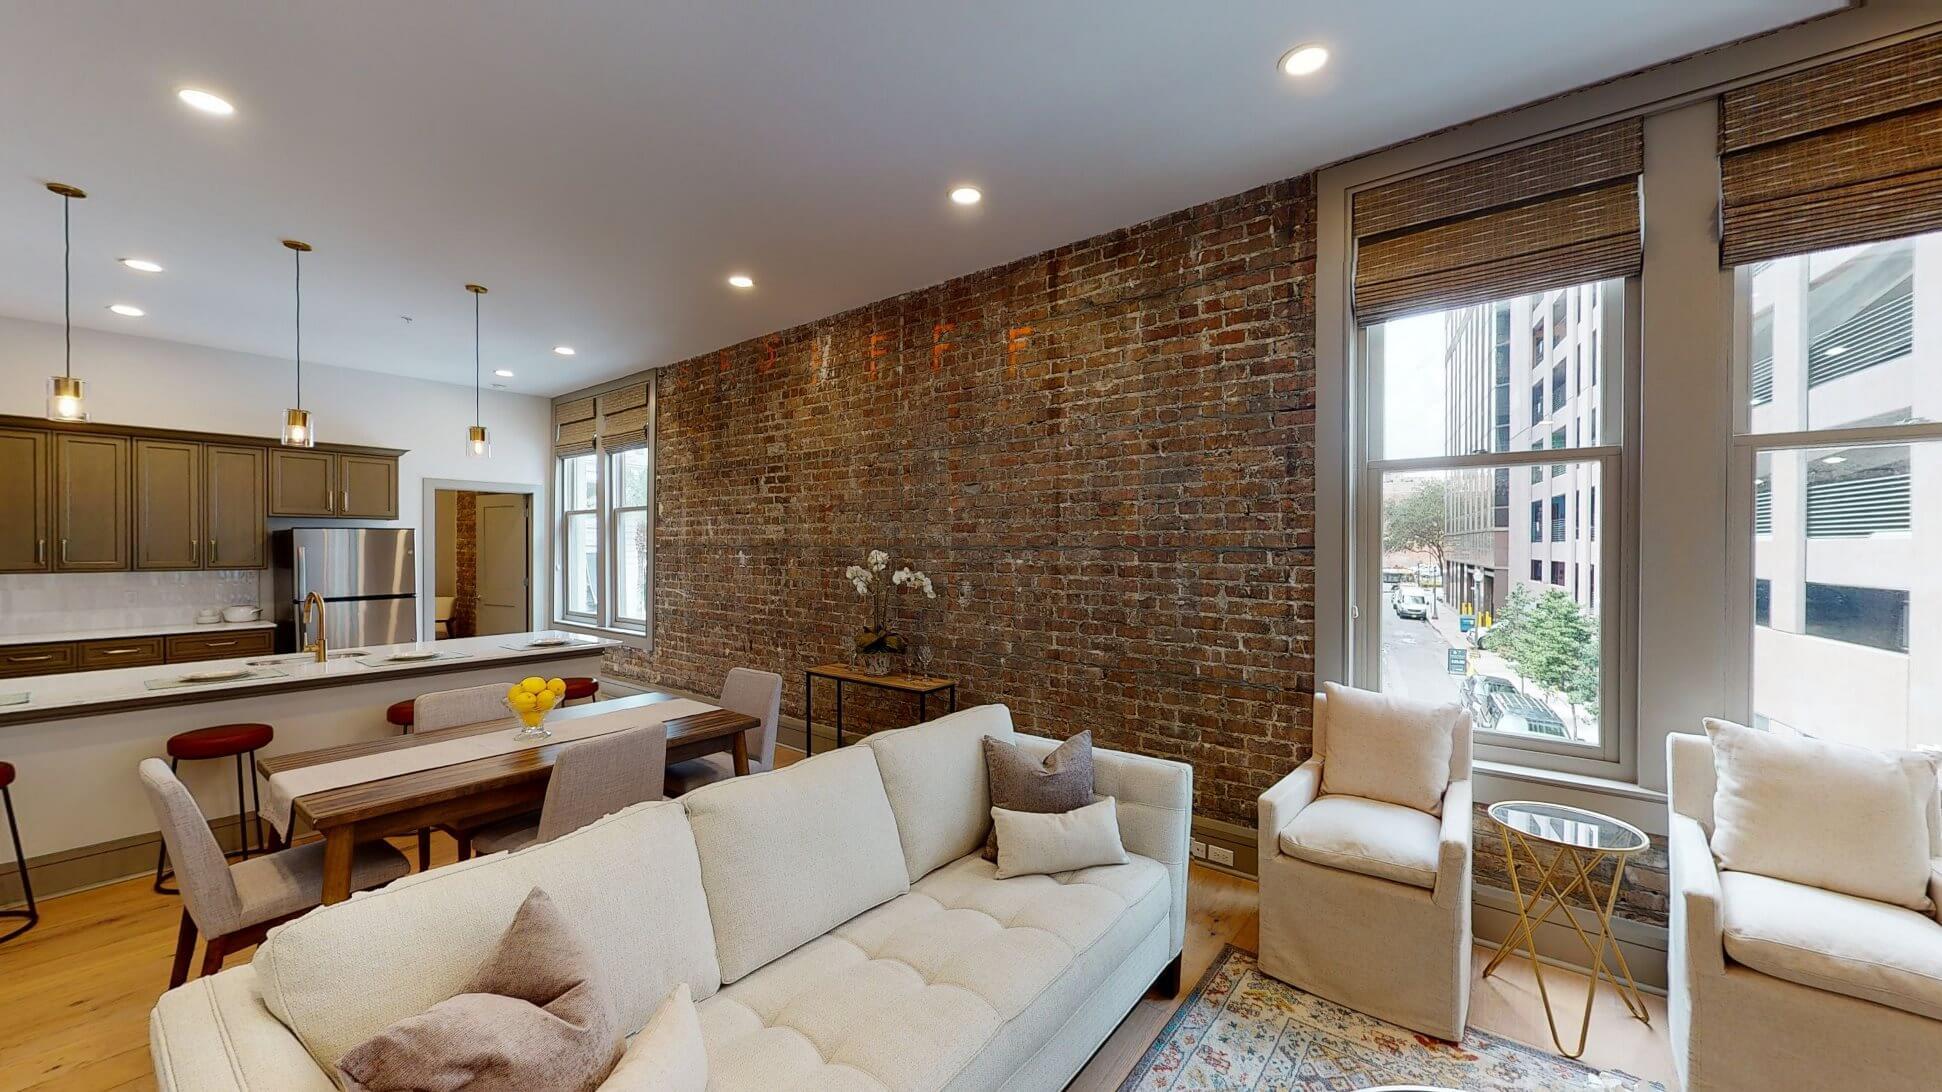 353 Baronne living area